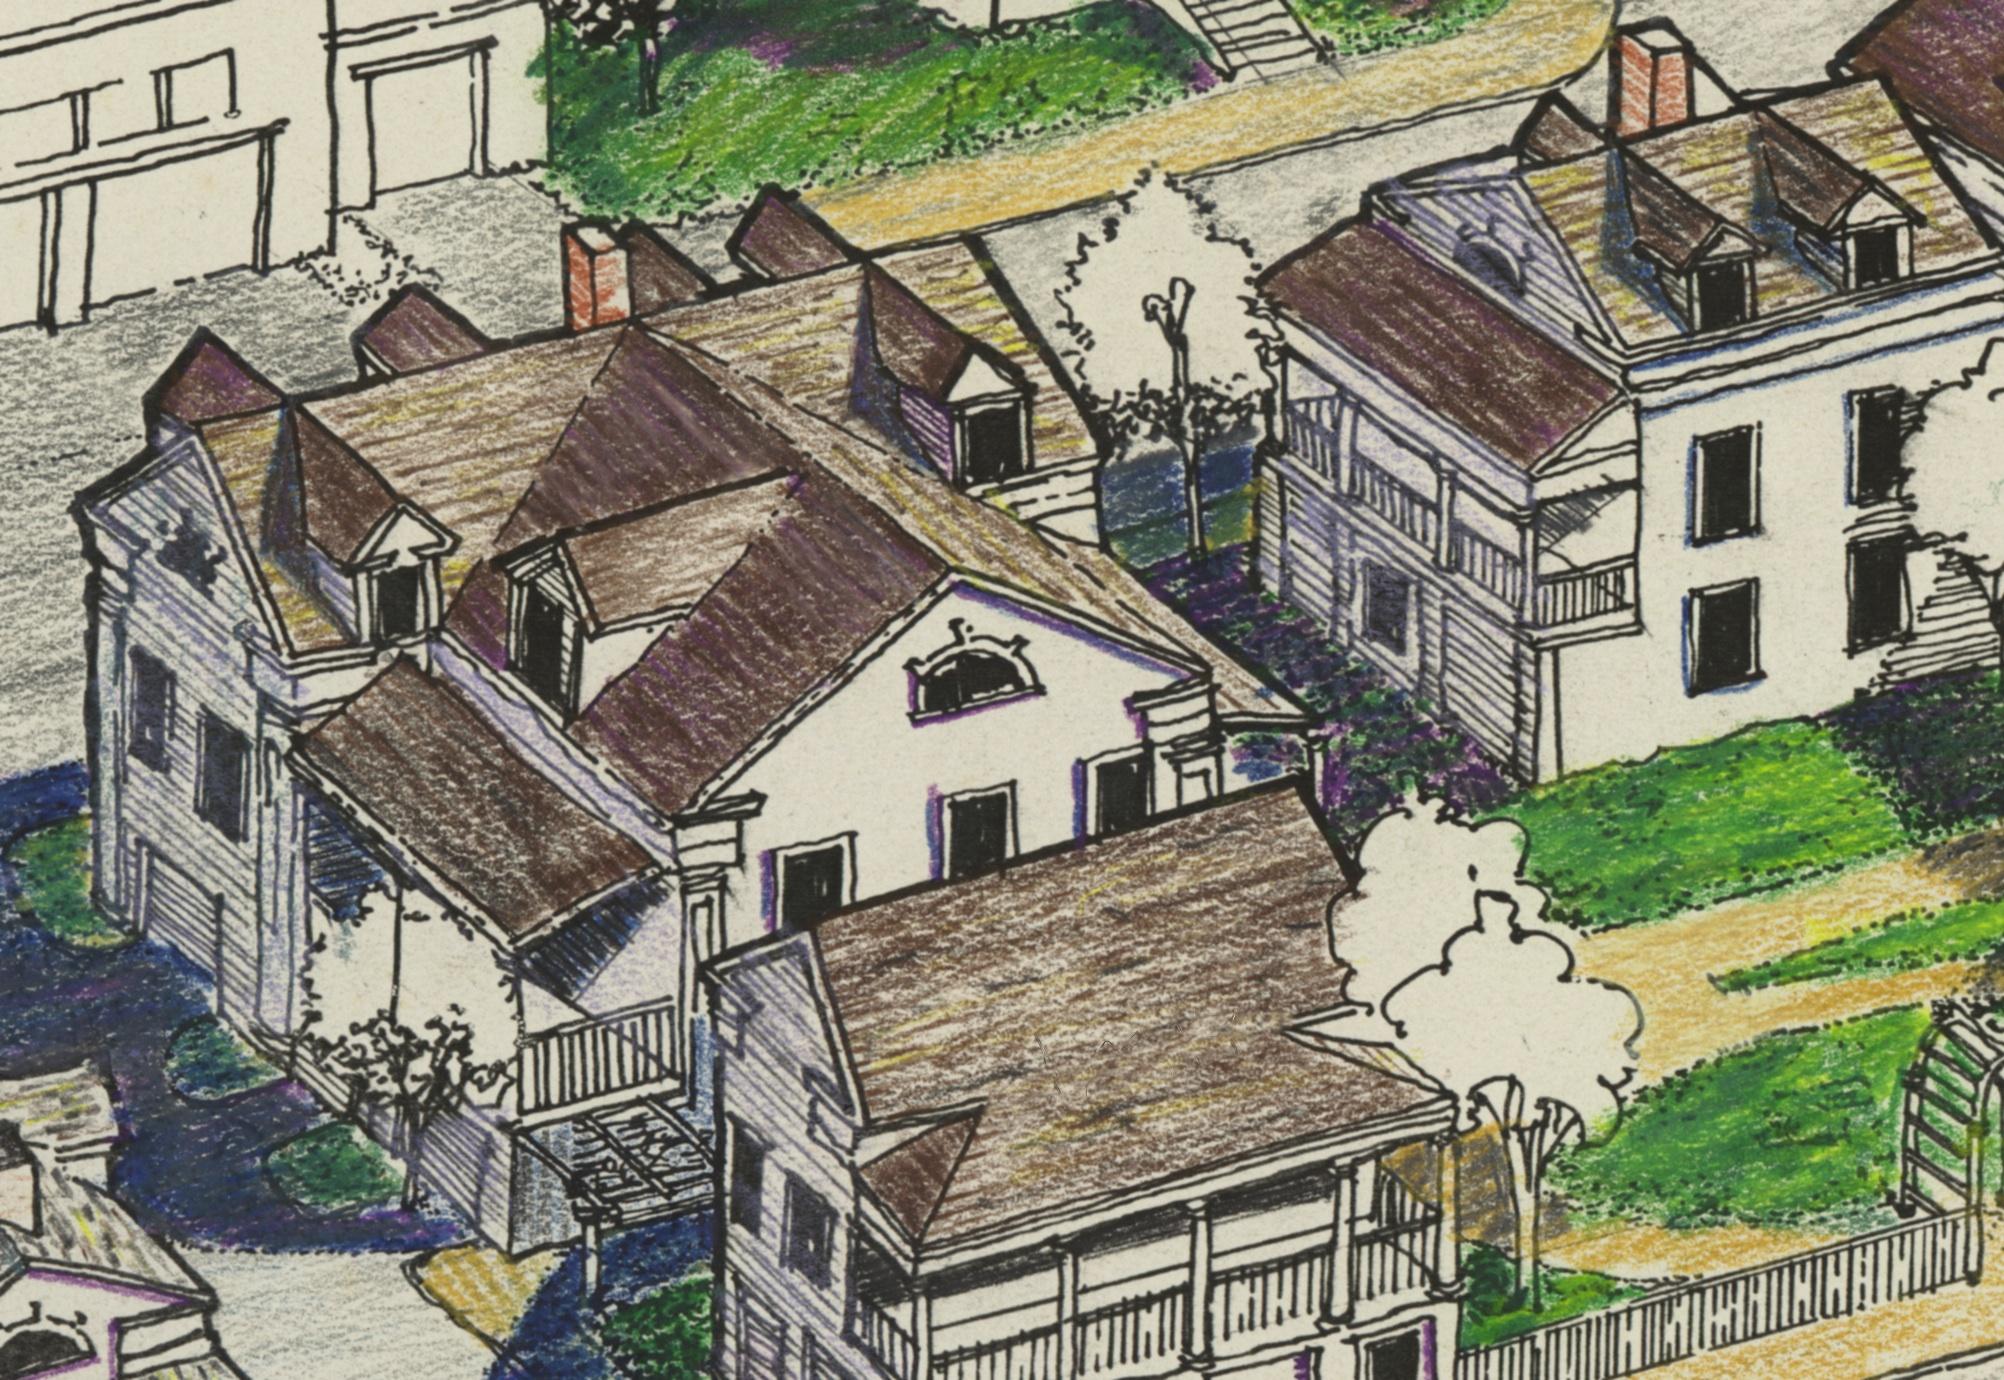 Mystic_Connecticut.Cottrell_Landing_Development.Neighborhood_Planning.Walkable.Robert_Orr_&_Associates.Architecture.Landscape_Architecture.New_Urbanism.Windom.Big_House_Compound.jpg